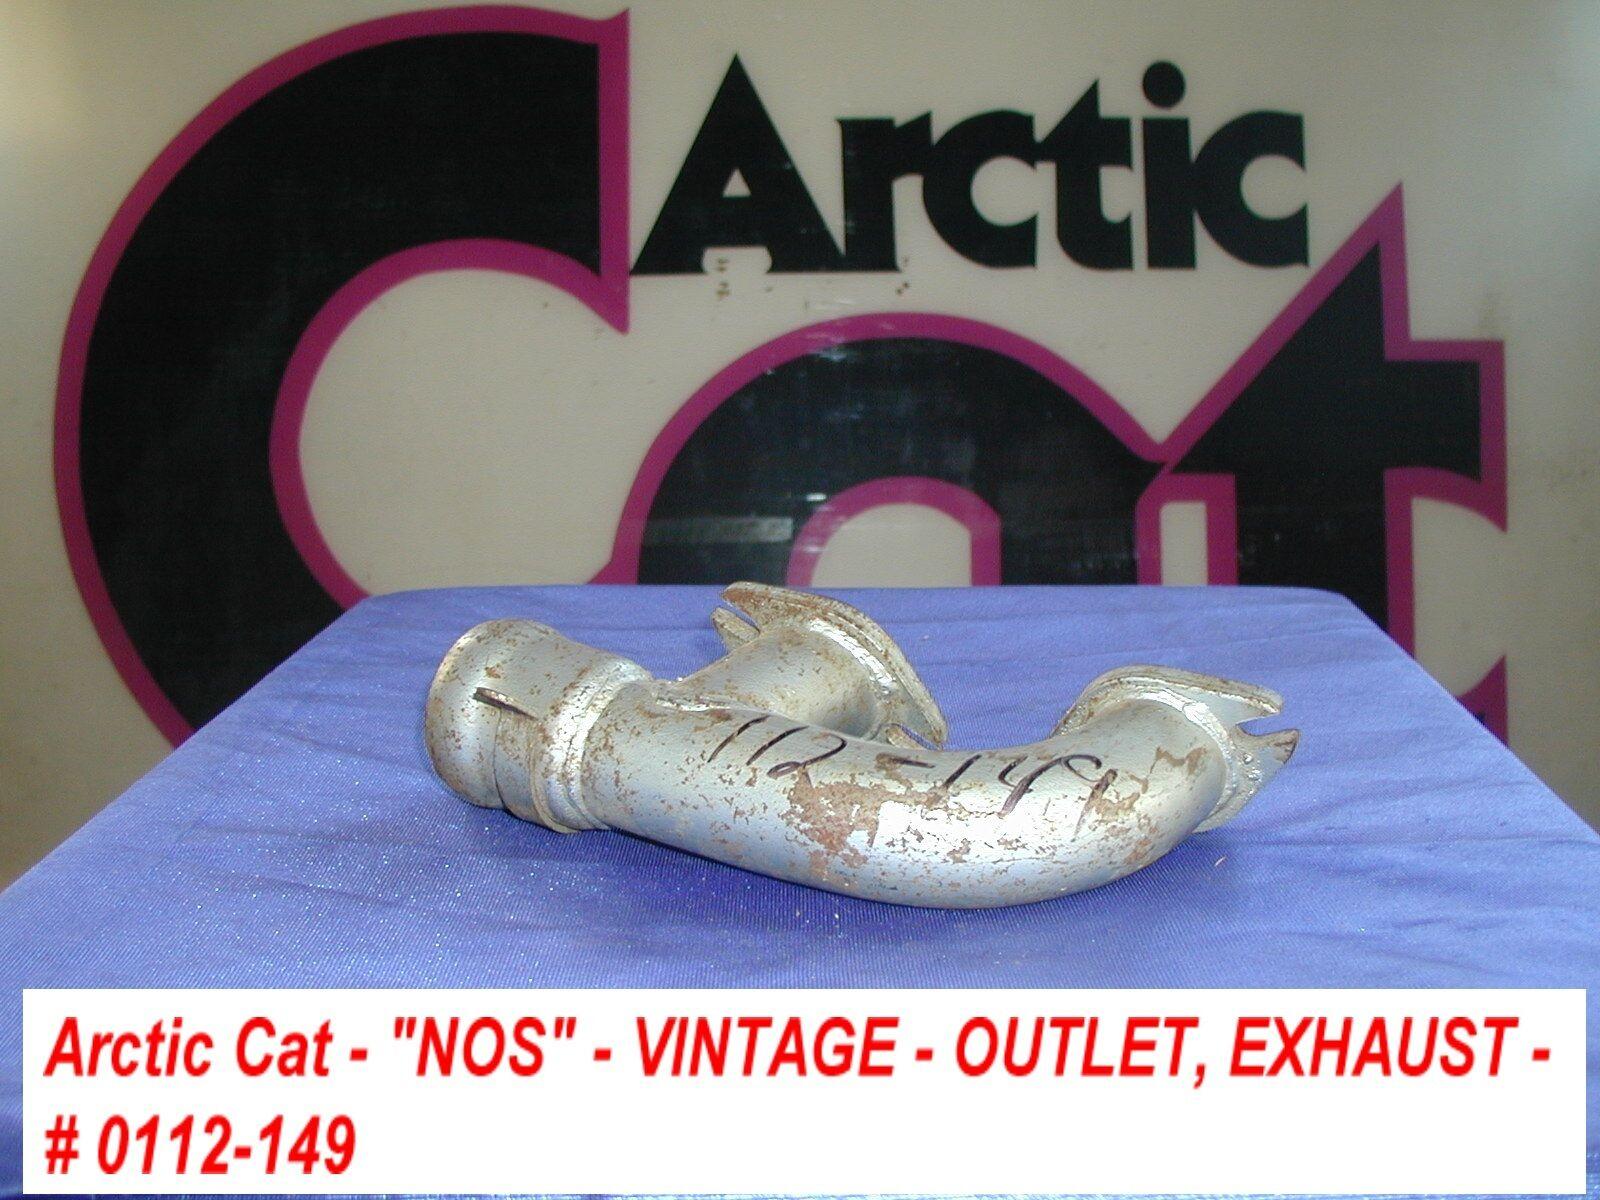 Arctic Cat Exhaust Manifold Outlet '71 EXT Vintage